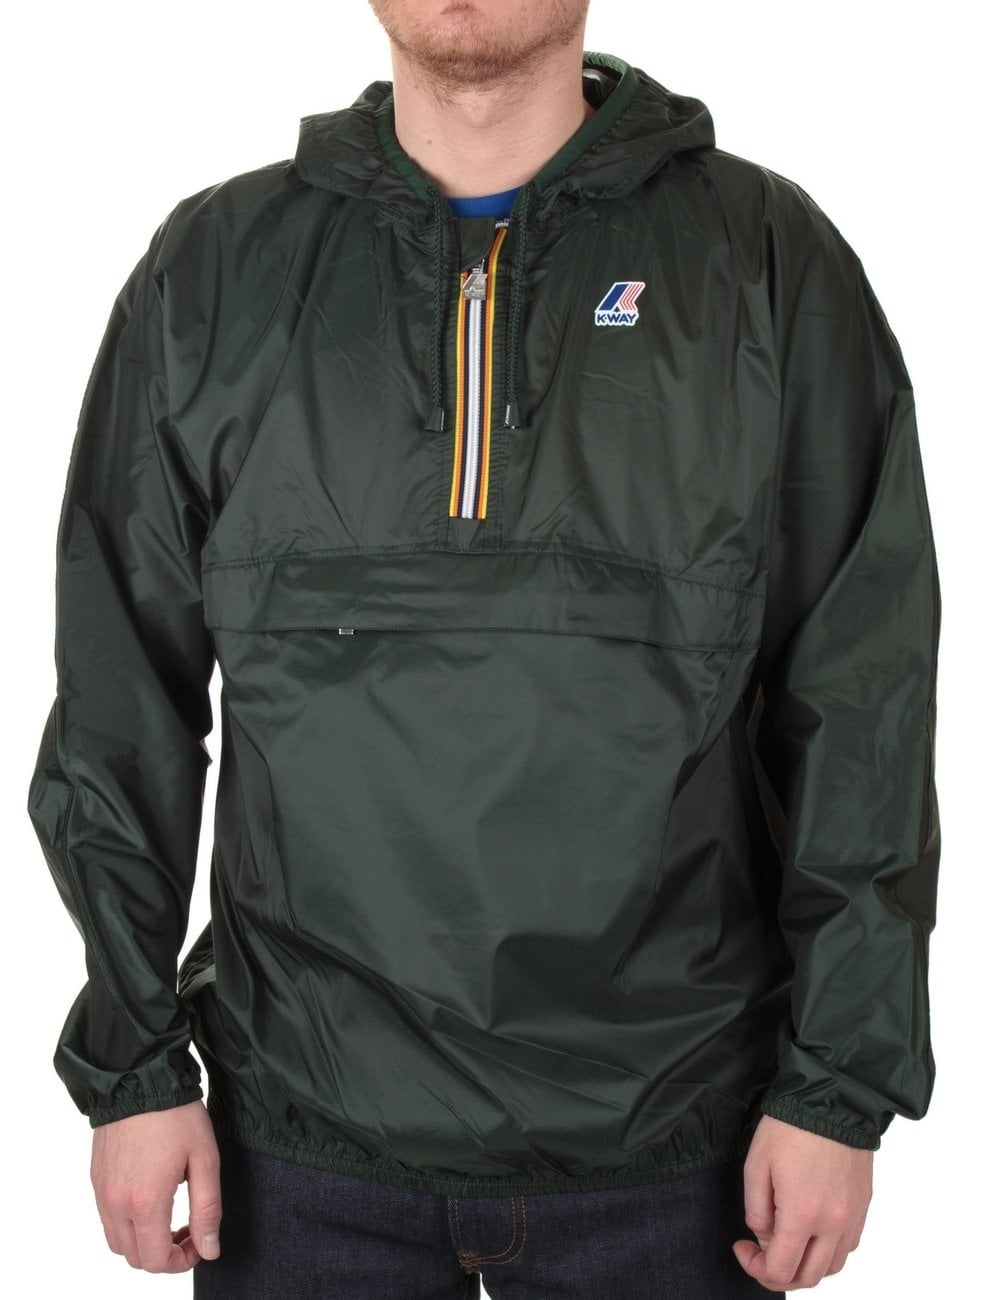 c8aaffe6b9ed K-Way Leon Half Zip Jacket - Forest - Clothing from Fat Buddha Store UK